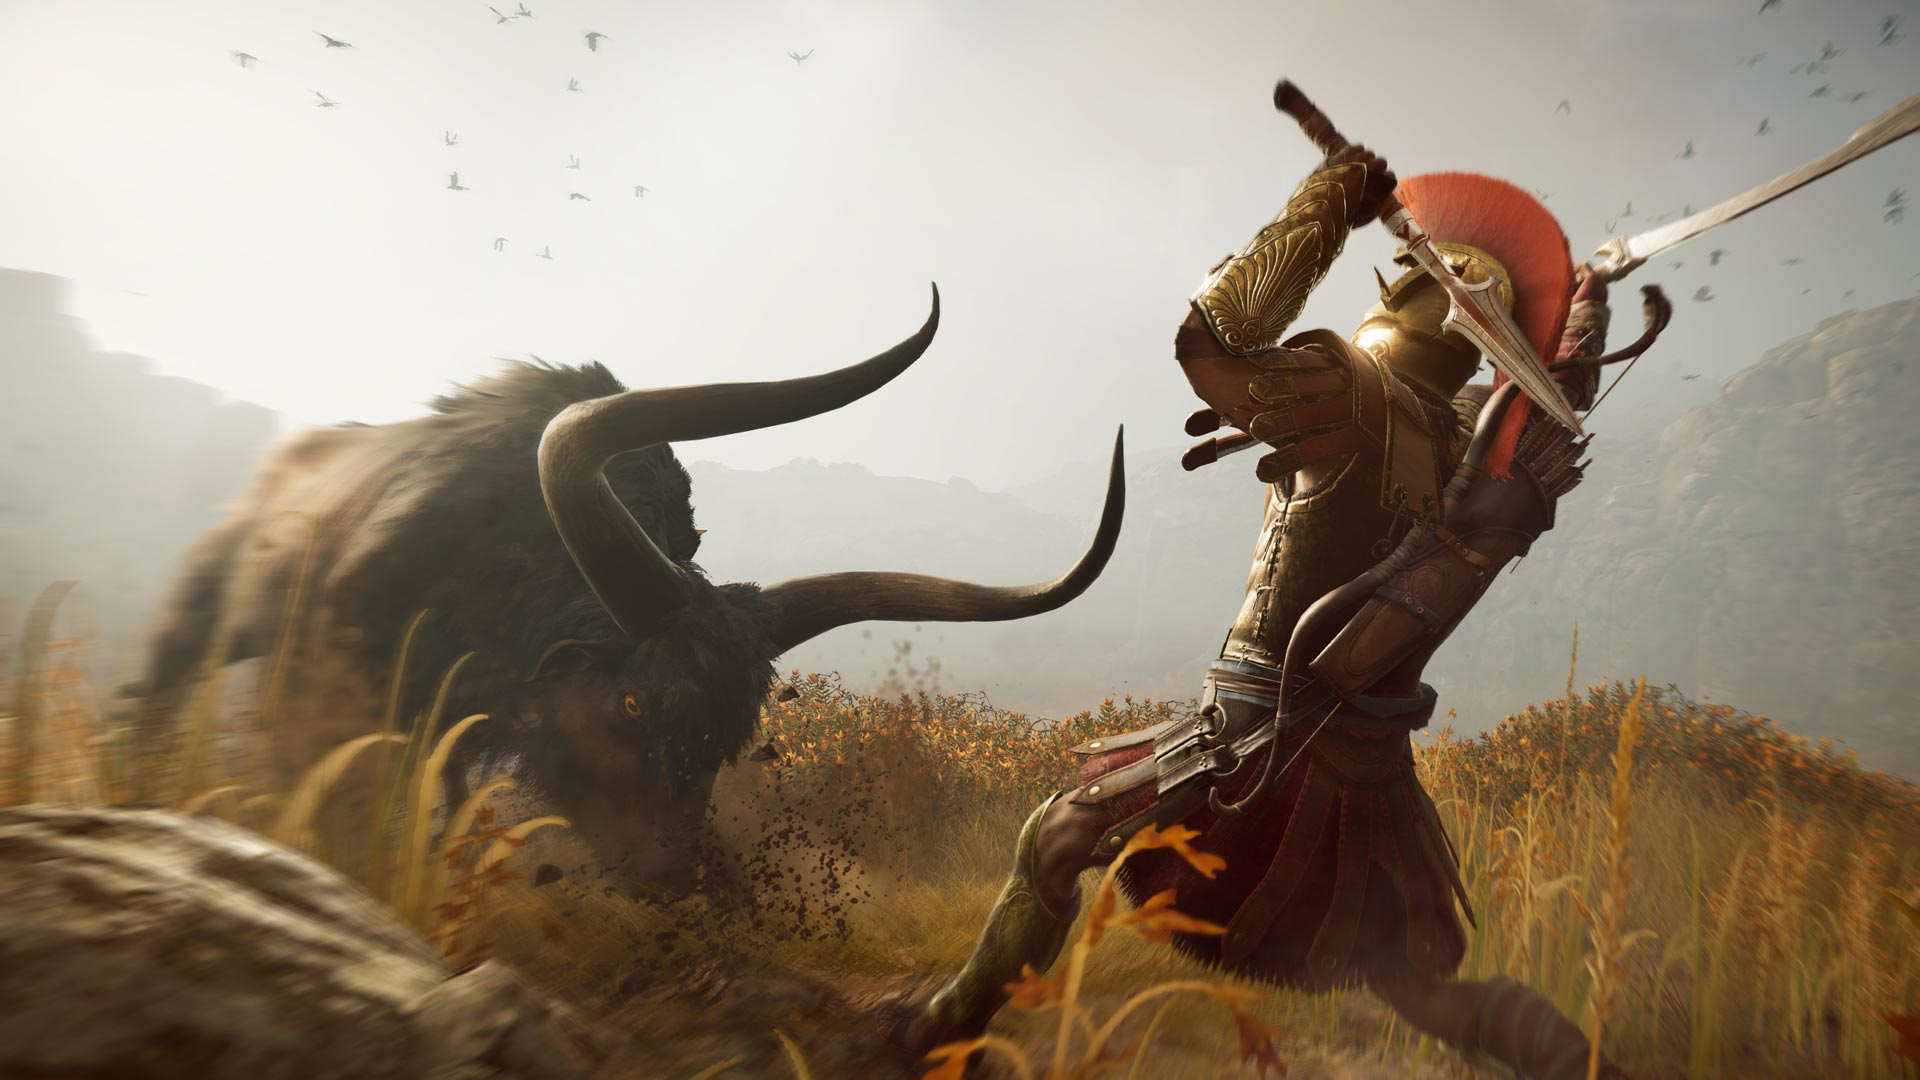 Assassin's Creed Odyssey: Gigantic battles & love